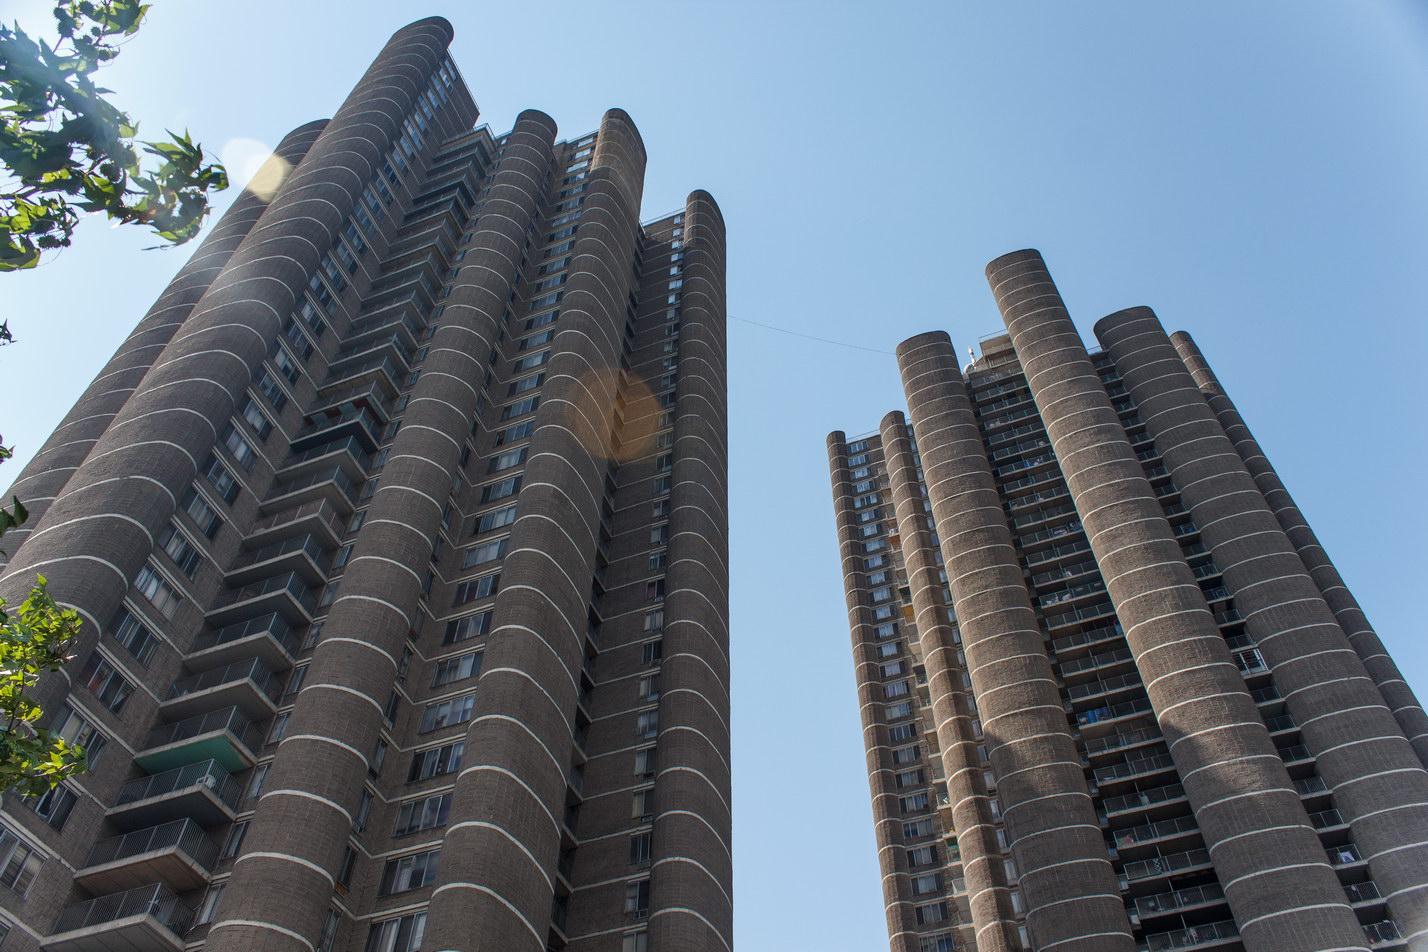 Unadorned concrete block facades are stark forms.